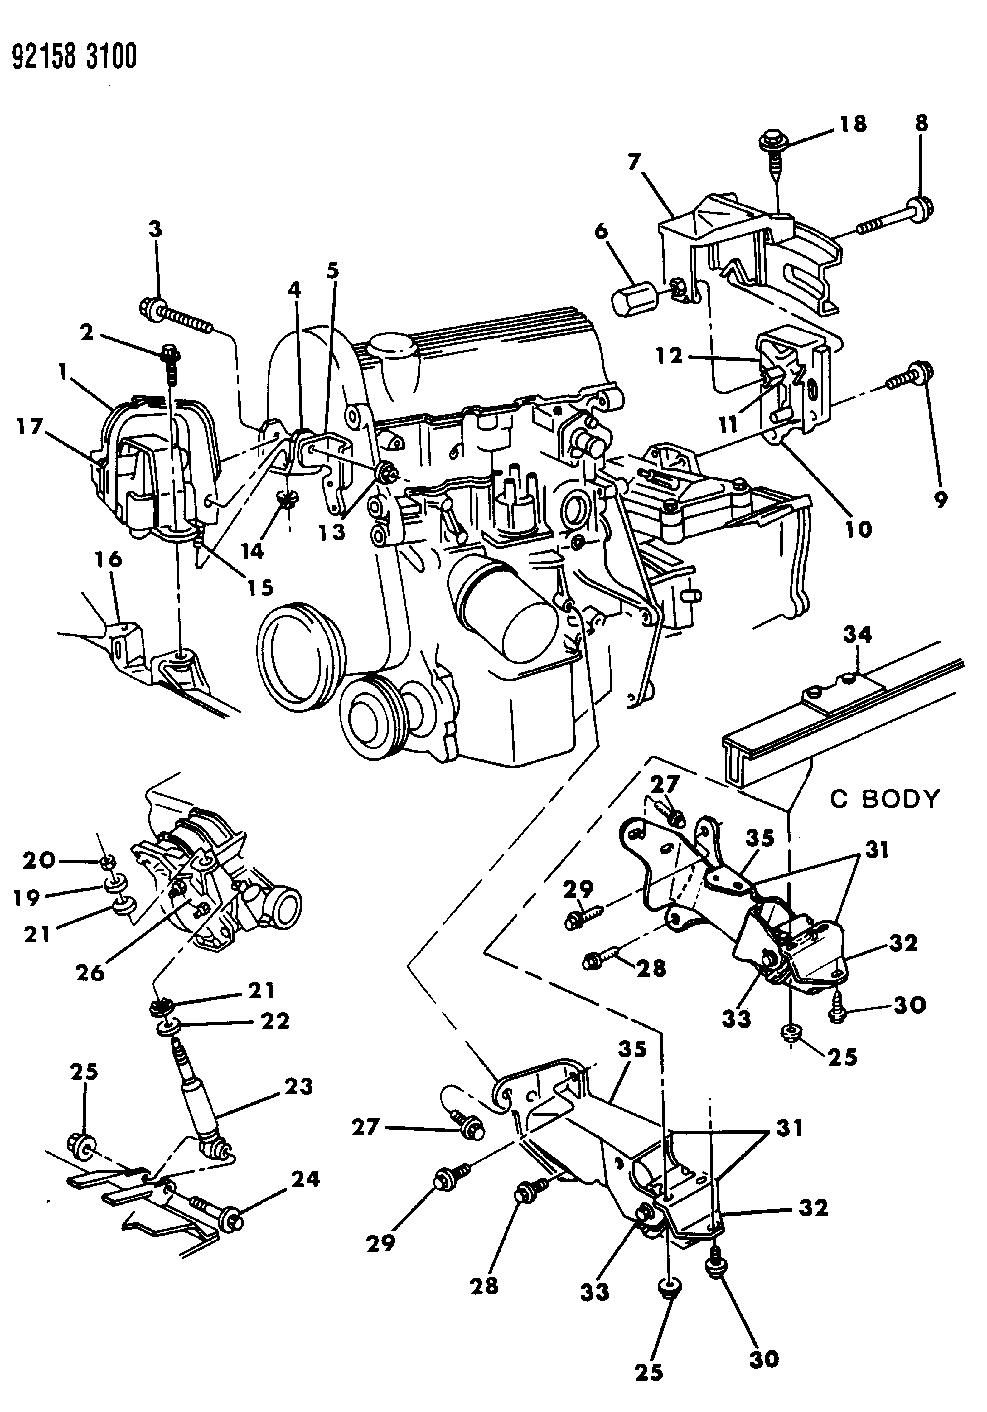 1992 Chrysler Lebaron Sedan Engine Mounting Mopar Parts Giant 3 8 Motor Mount Diagram Thumbnail